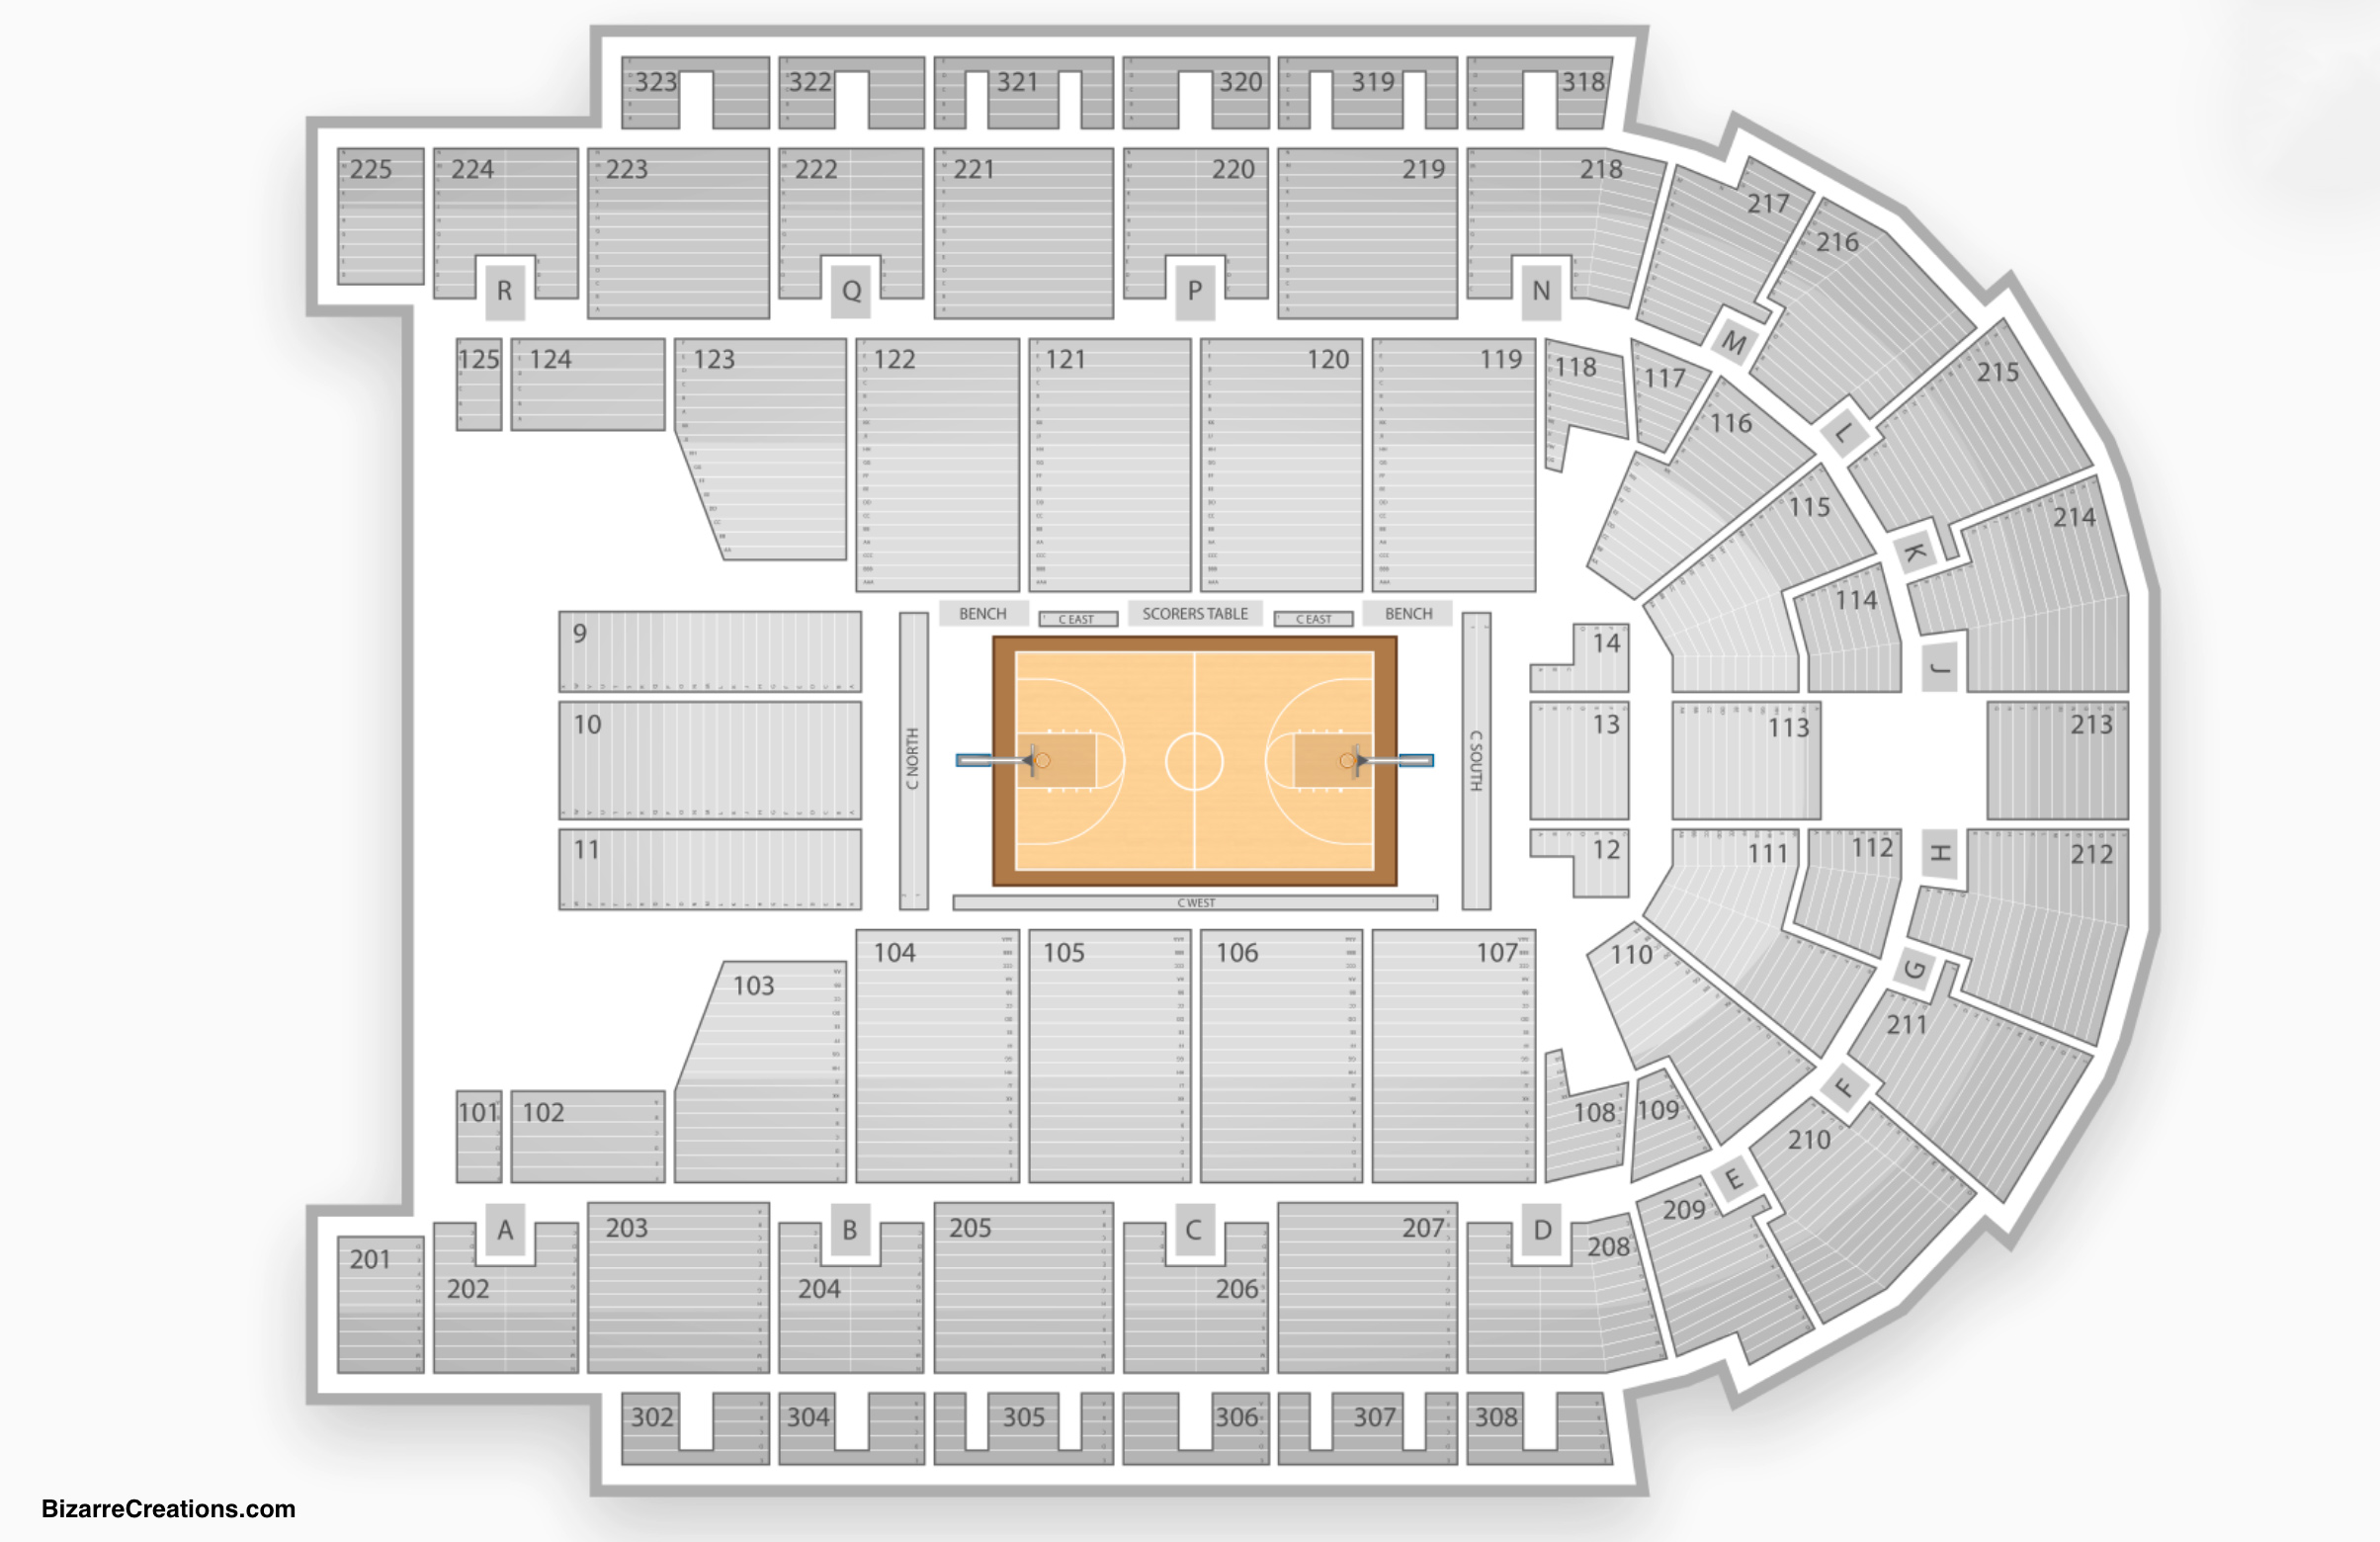 Boardwalk Hall Seating Chart Basketball